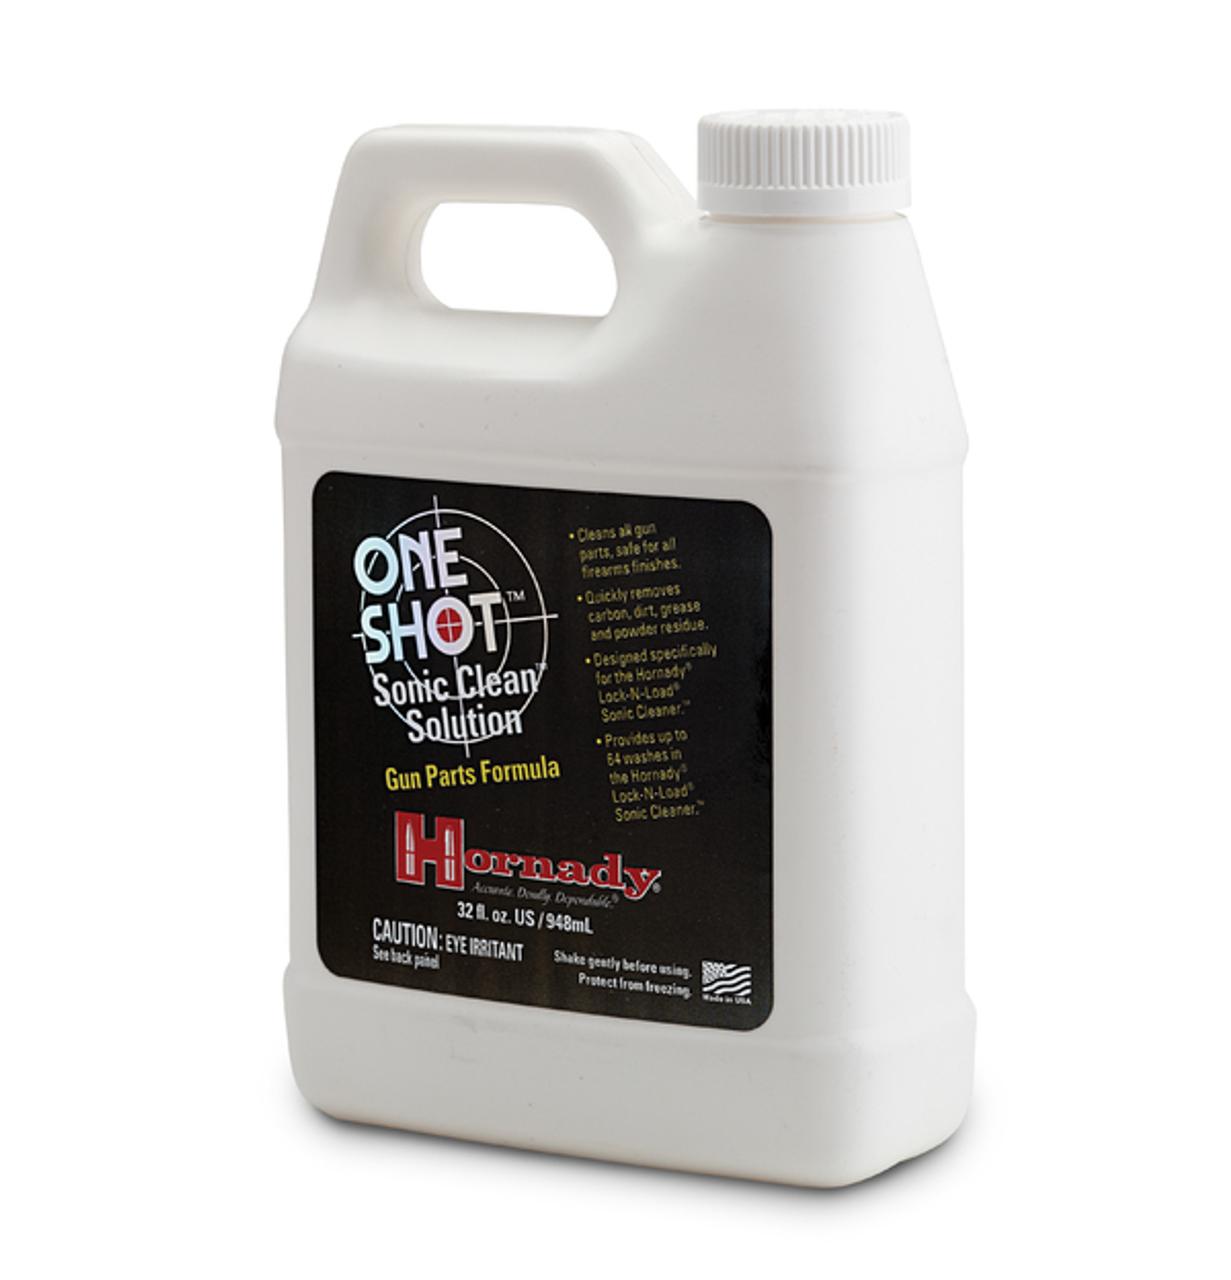 ONE SHOT® SONIC CLEAN™ GUN PARTS SOLUTION